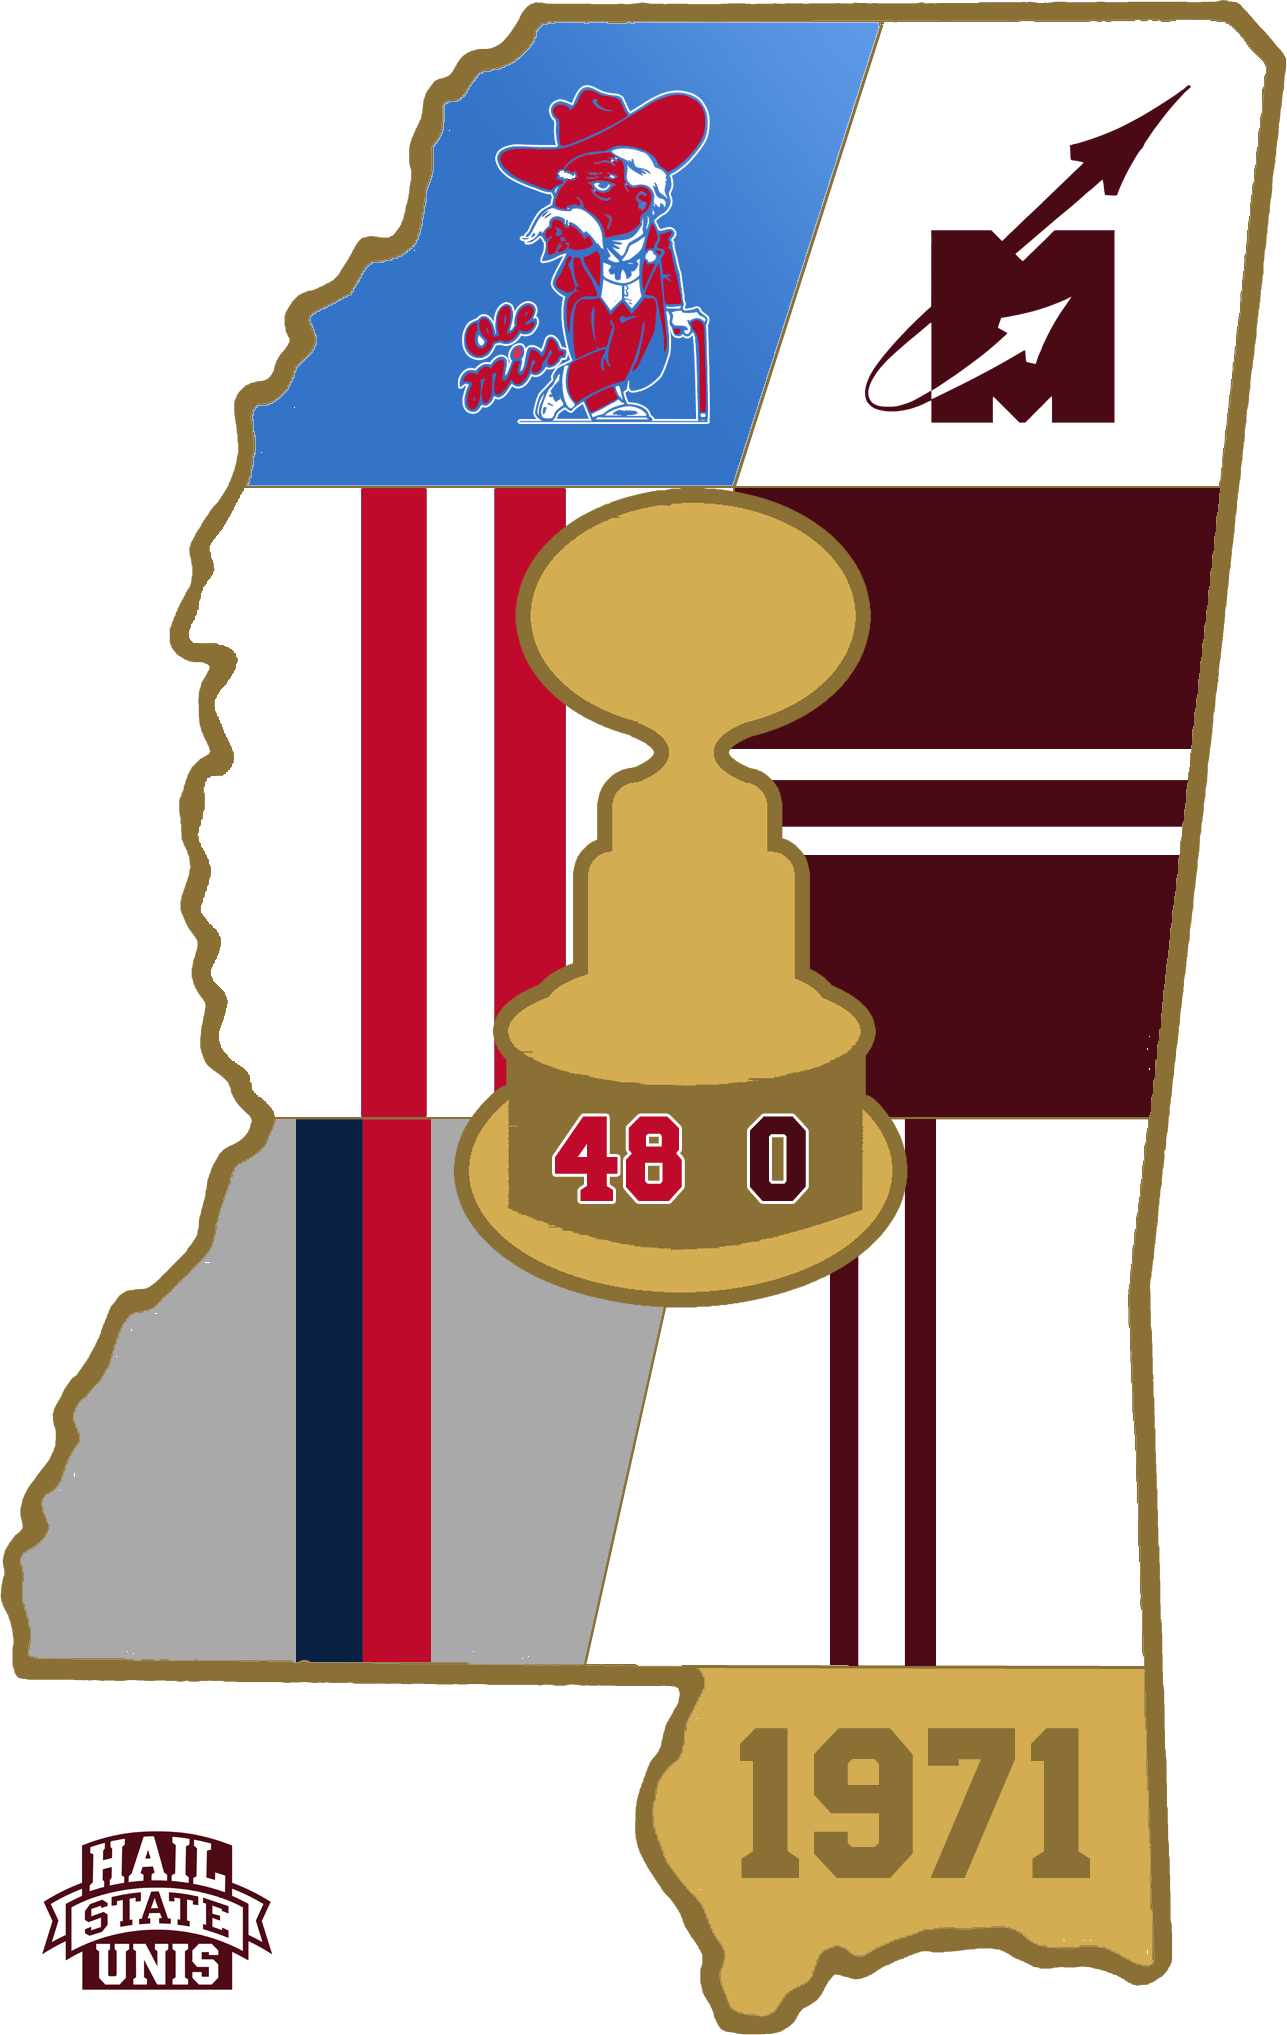 Navy blue football clipart image royalty free Egg Bowl Uniform History - Hail State Unis image royalty free